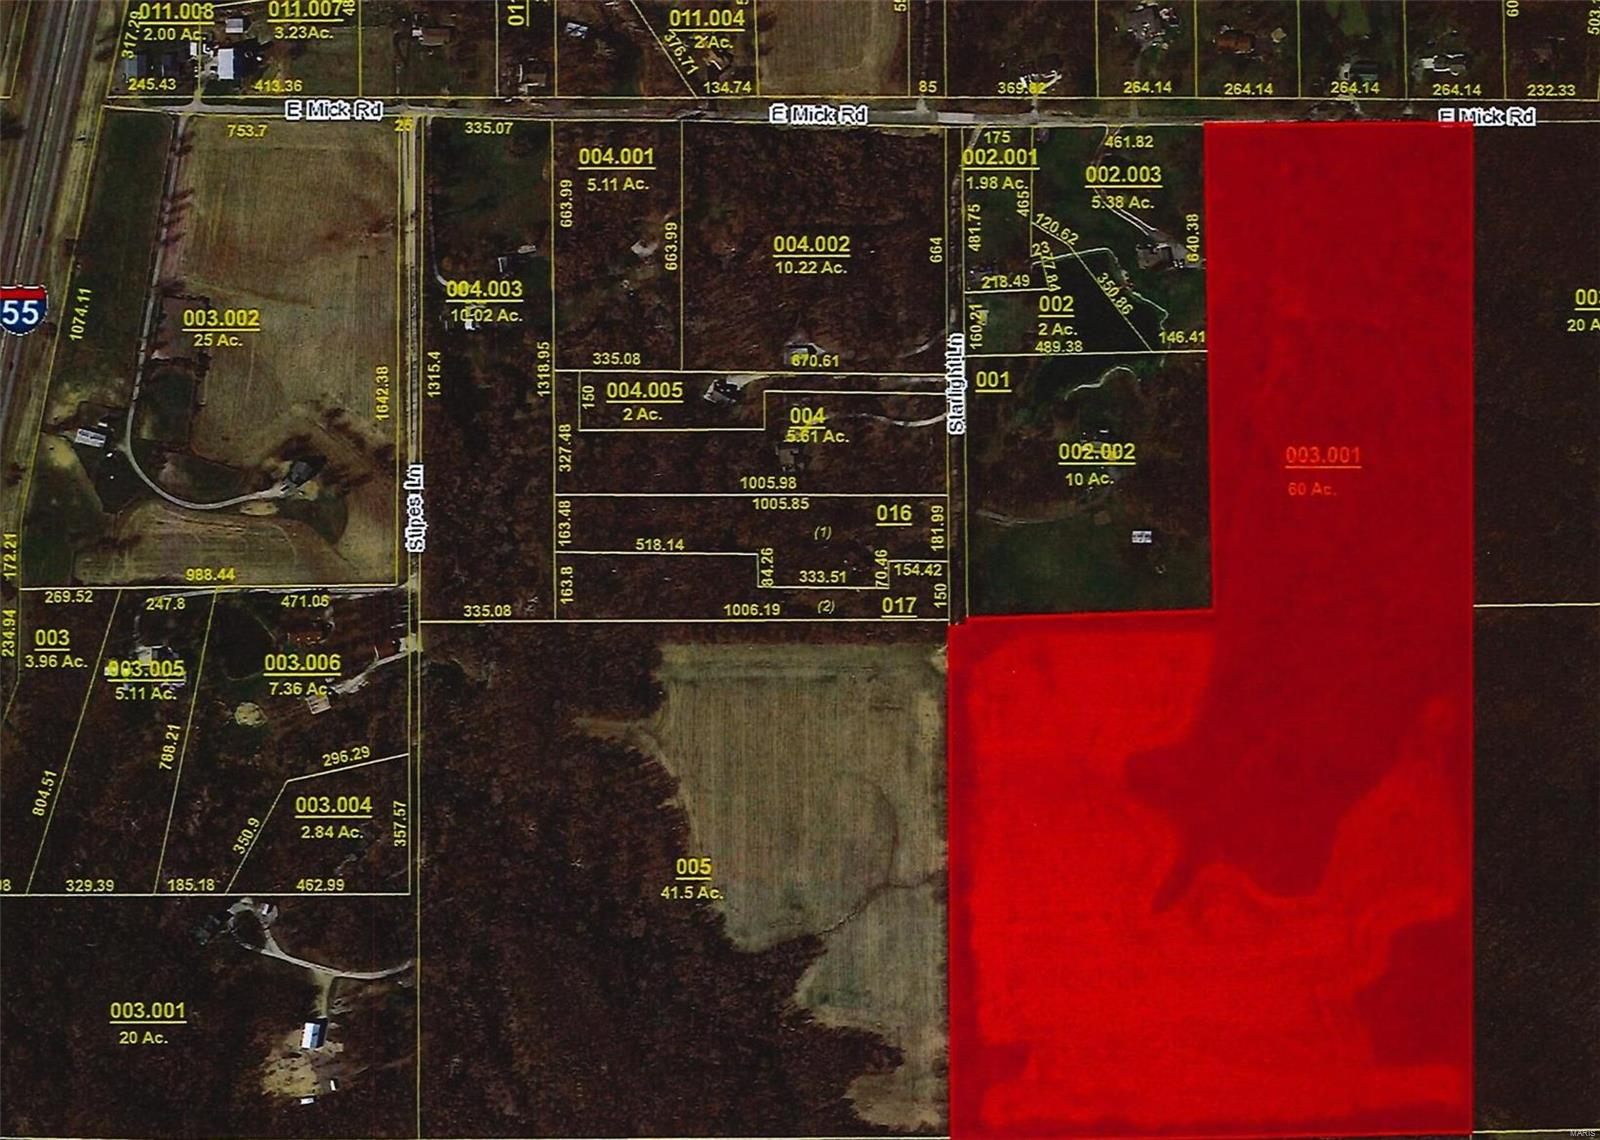 8050 E Mick Road Property Photo - Edwardsville, IL real estate listing